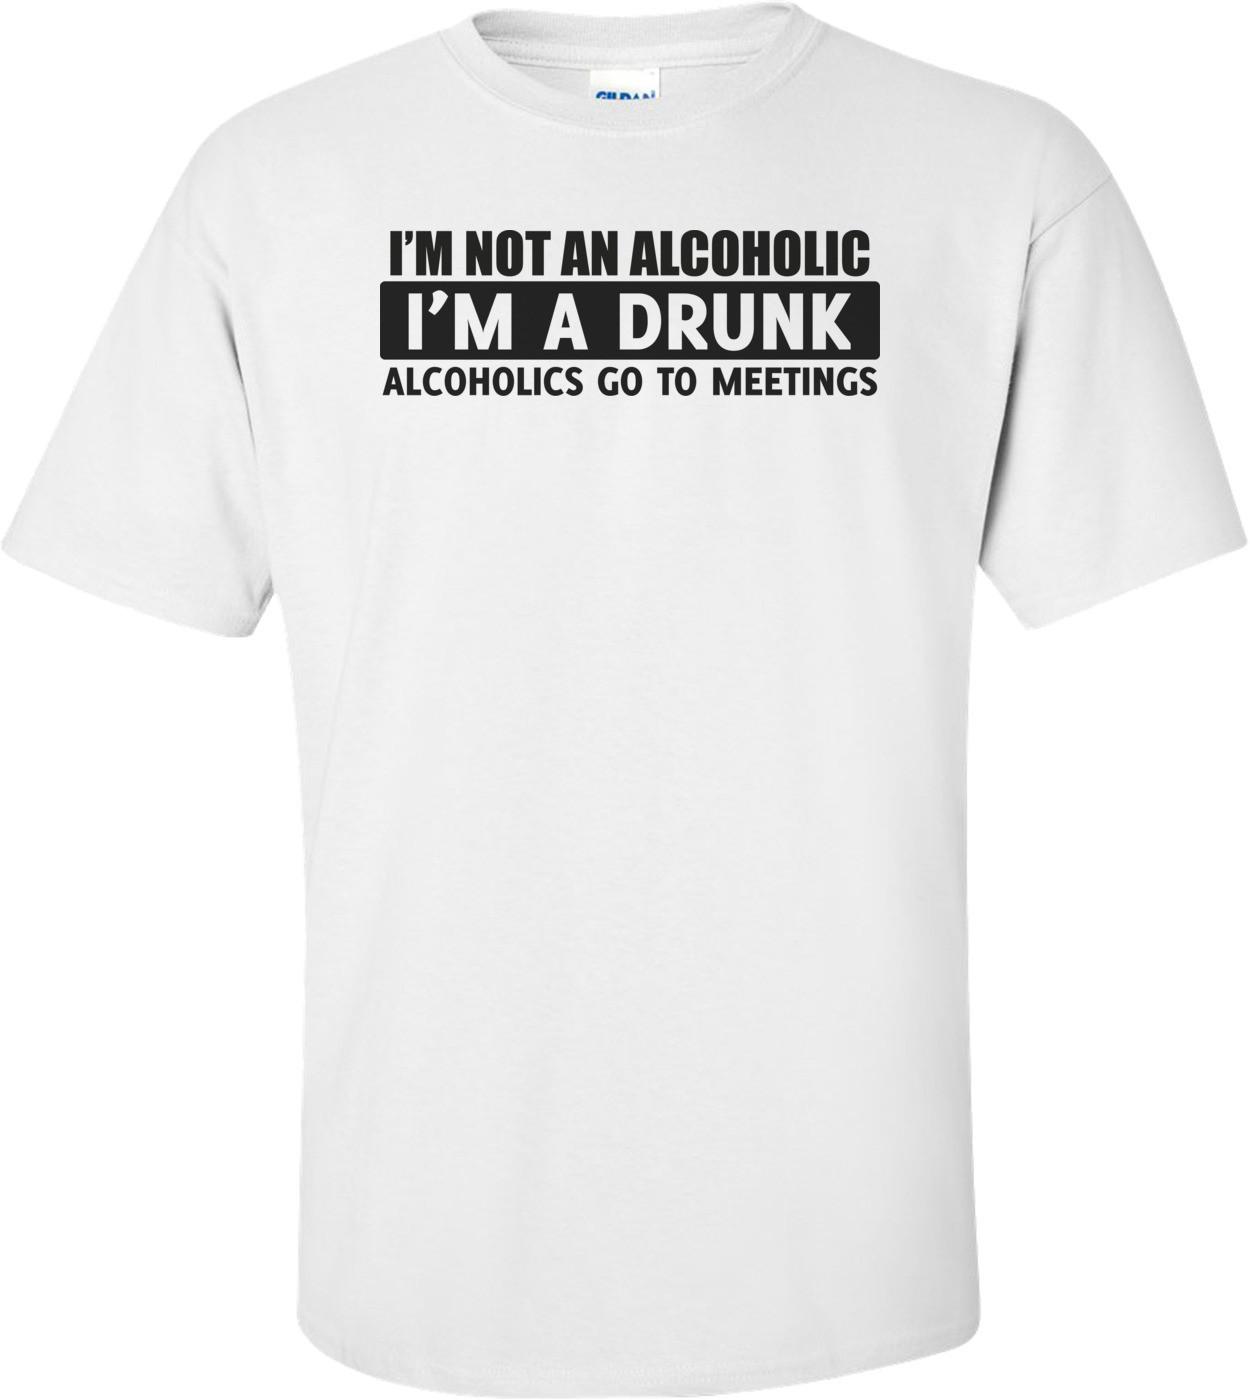 I'm Not An Alcoholic, I'm A Drunk T-shirt